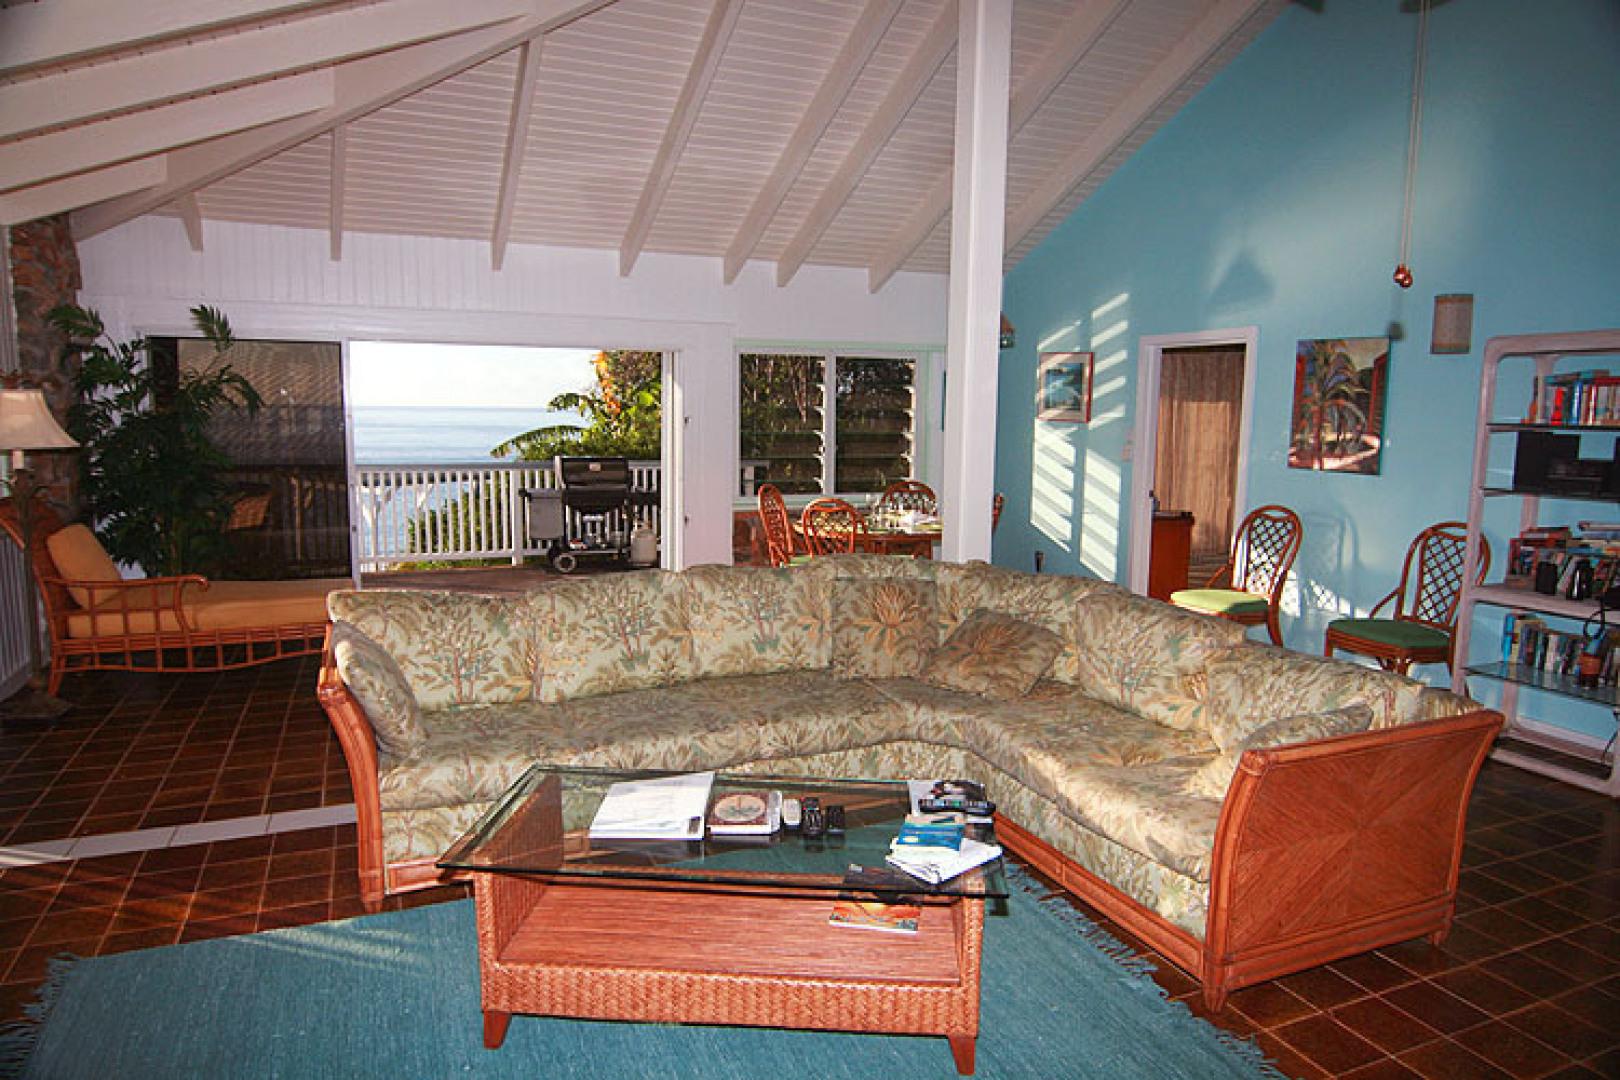 892 The Paradigm Living Room Set Grey: 92 Chocolate Hole, St. John, USVI 00830, MLS# 11-117